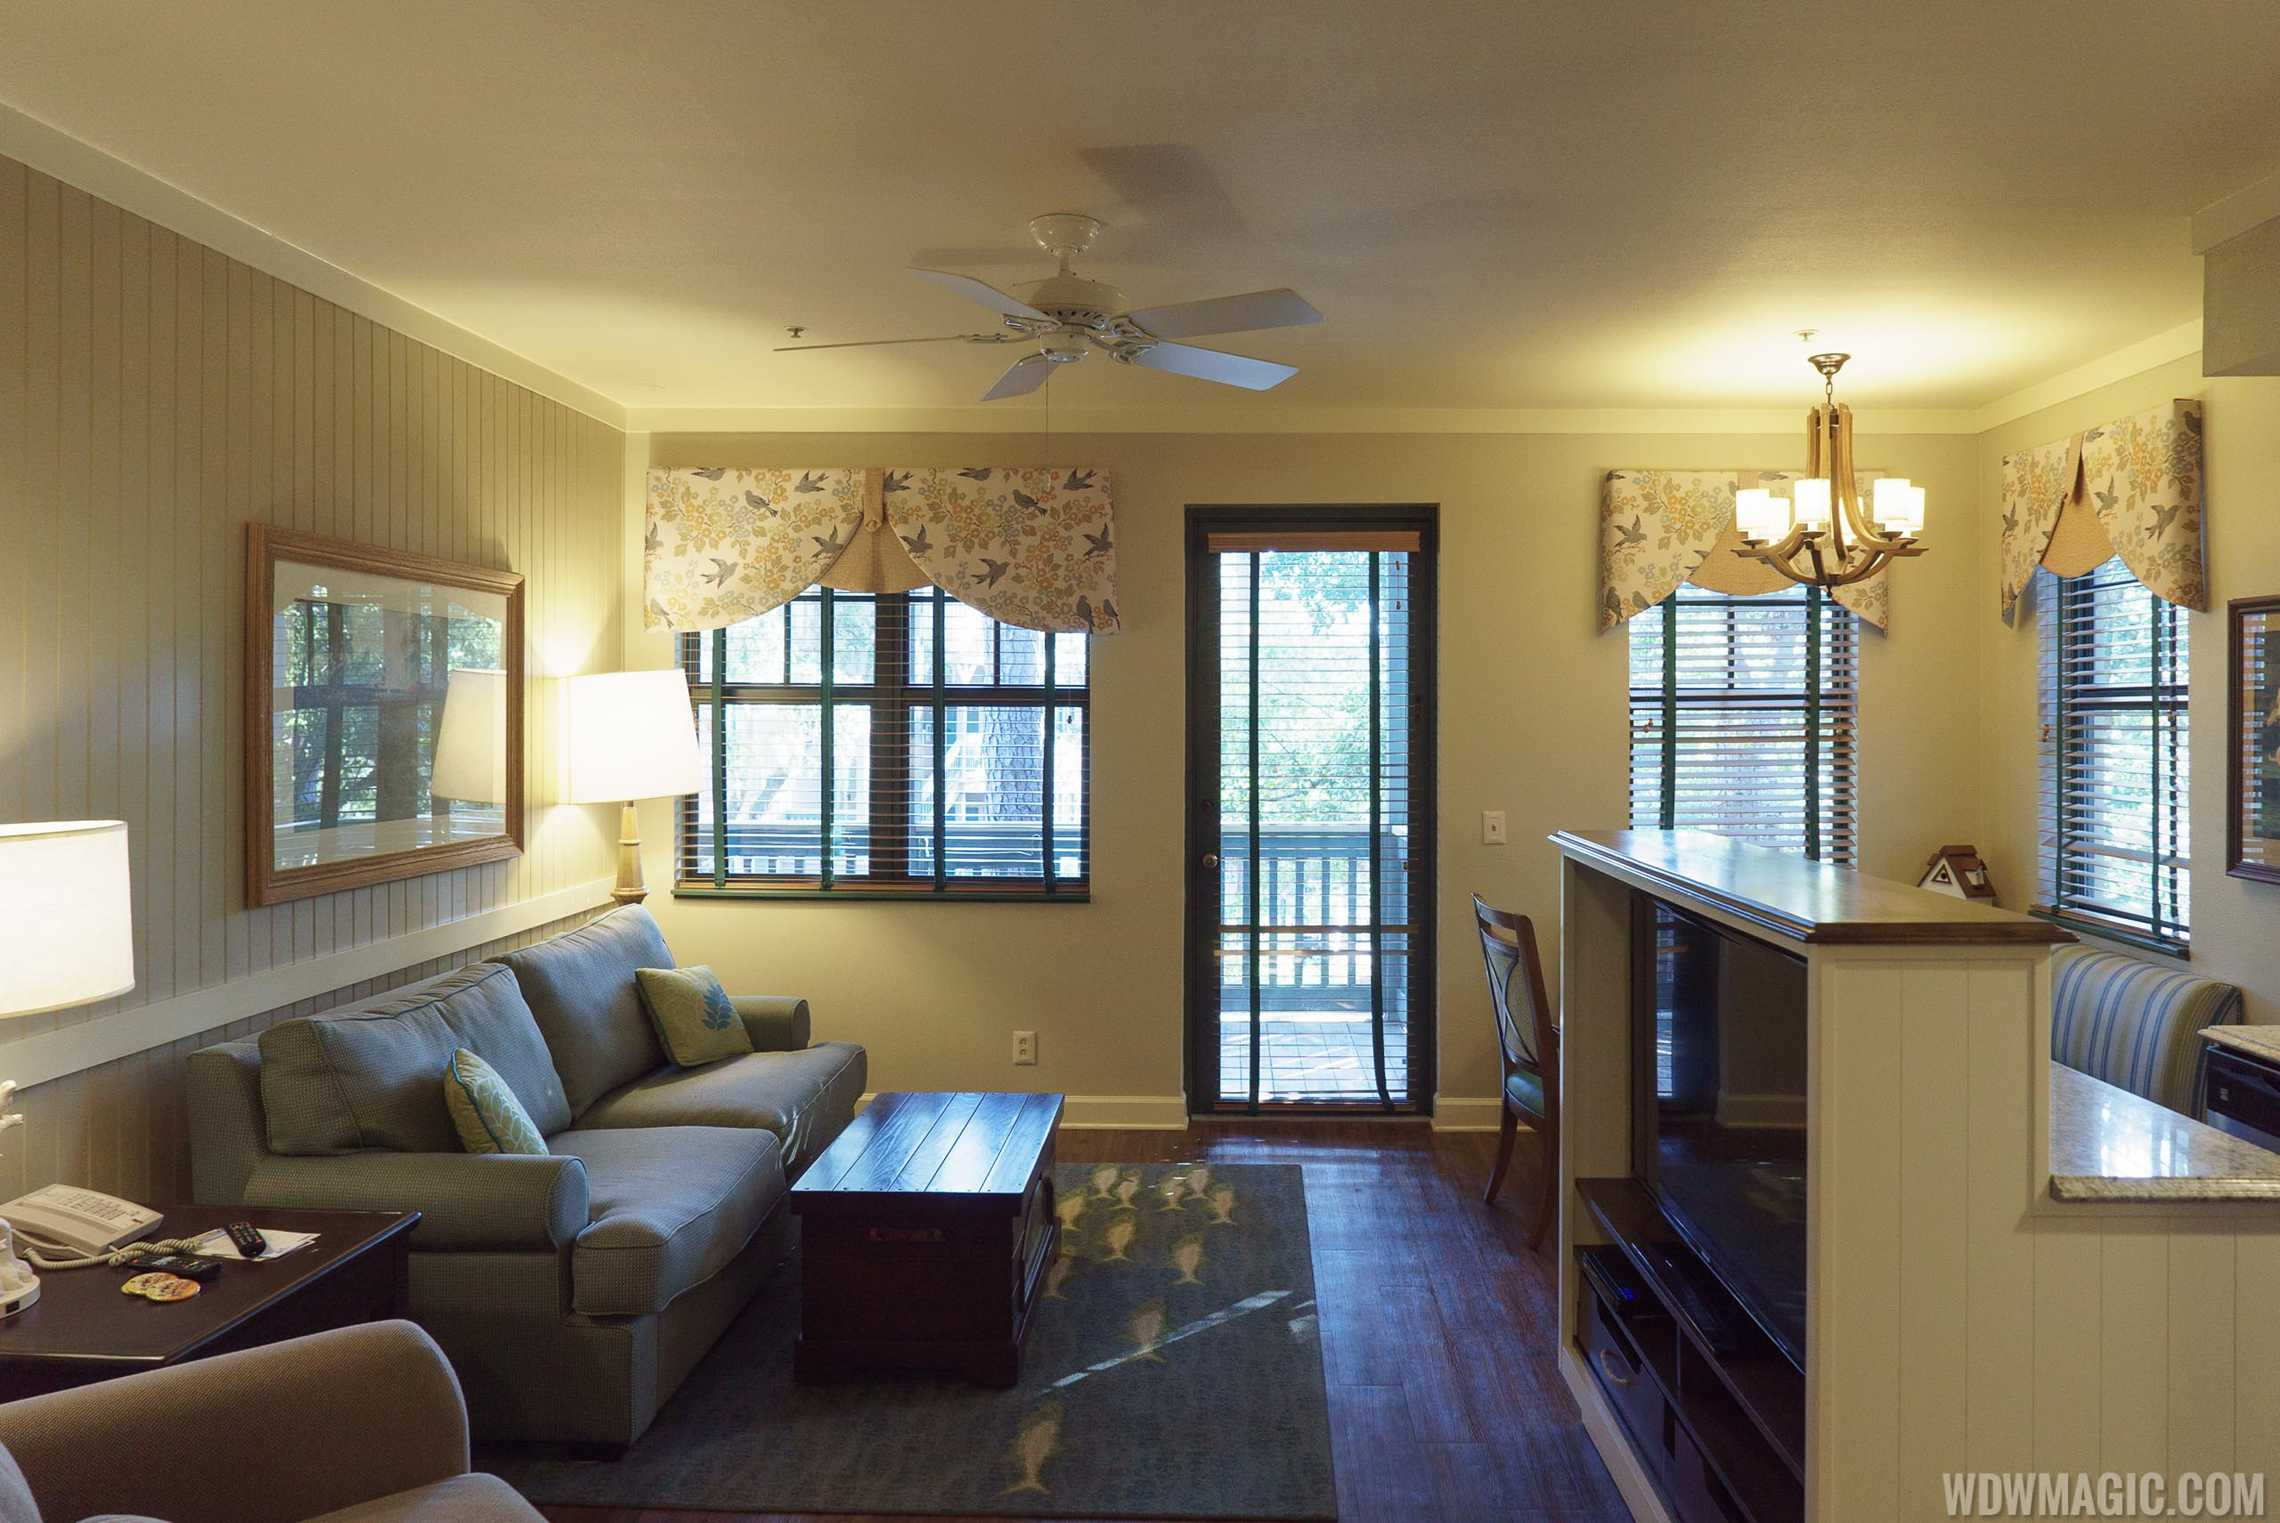 Disney 39 S Hilton Head Island Resort Guest Room Photo 39 Of 49